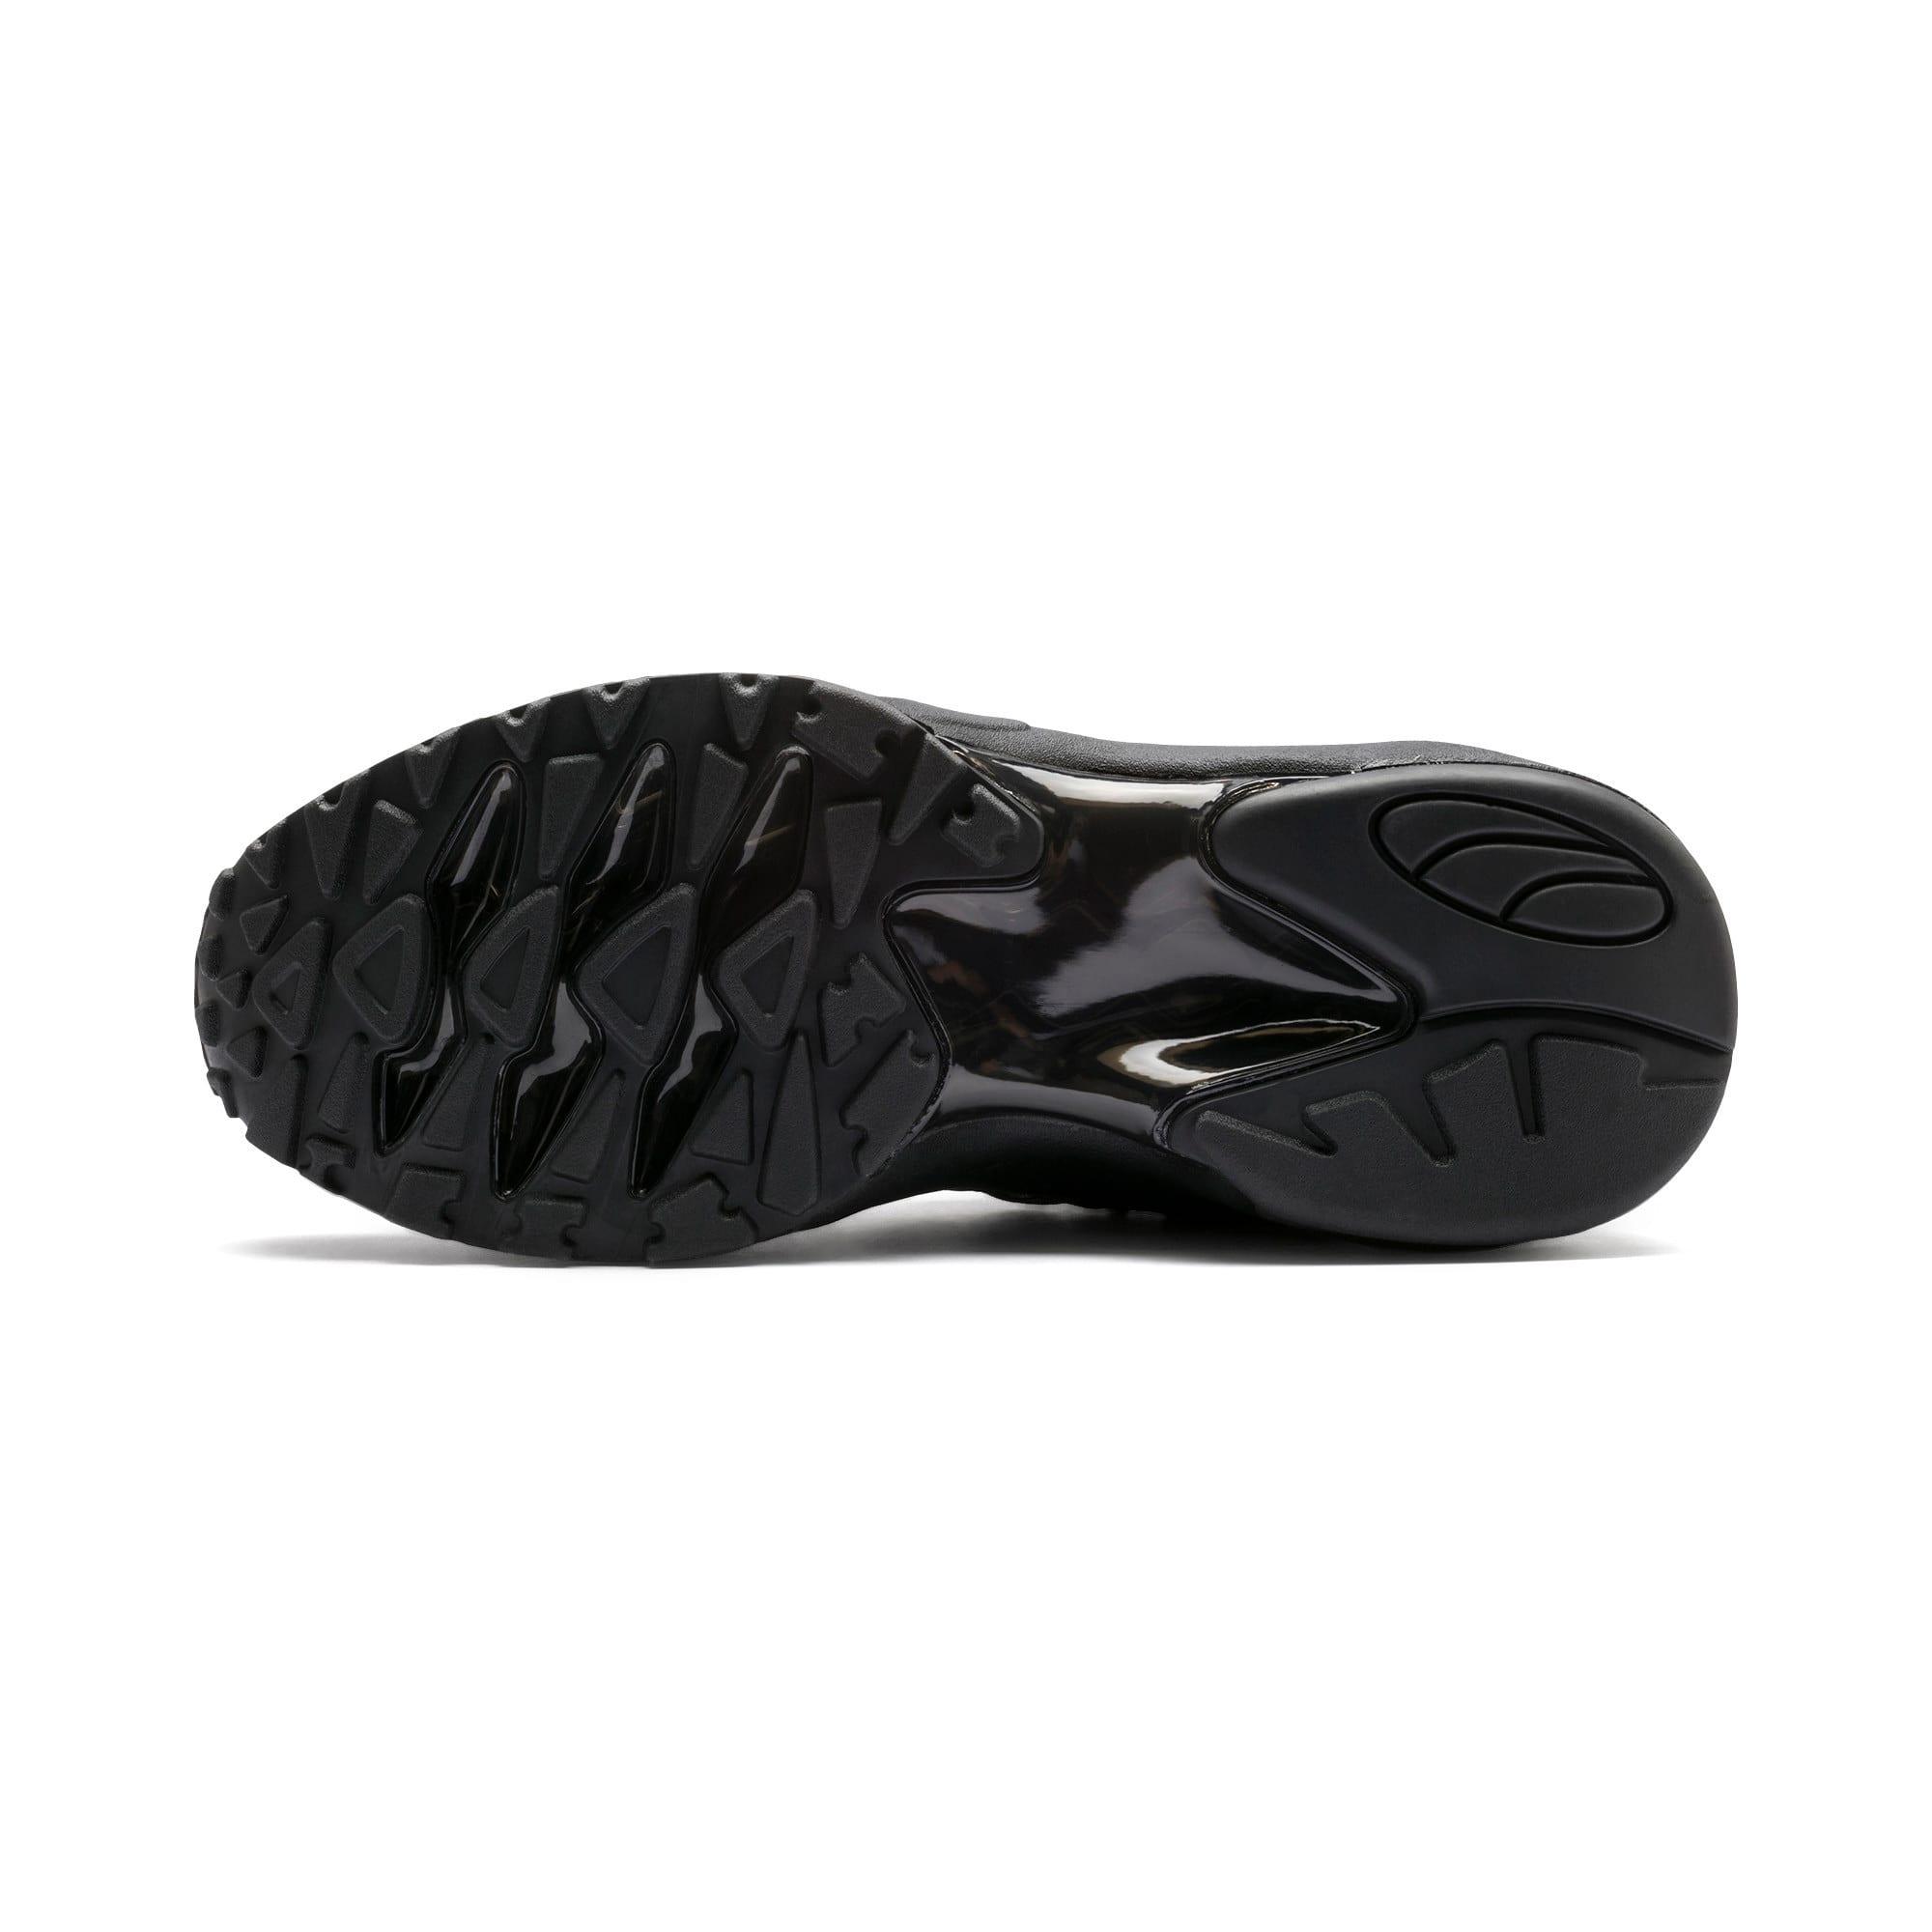 Thumbnail 5 of CELL Endura Rebound sportschoenen, Puma Black-Puma Black, medium